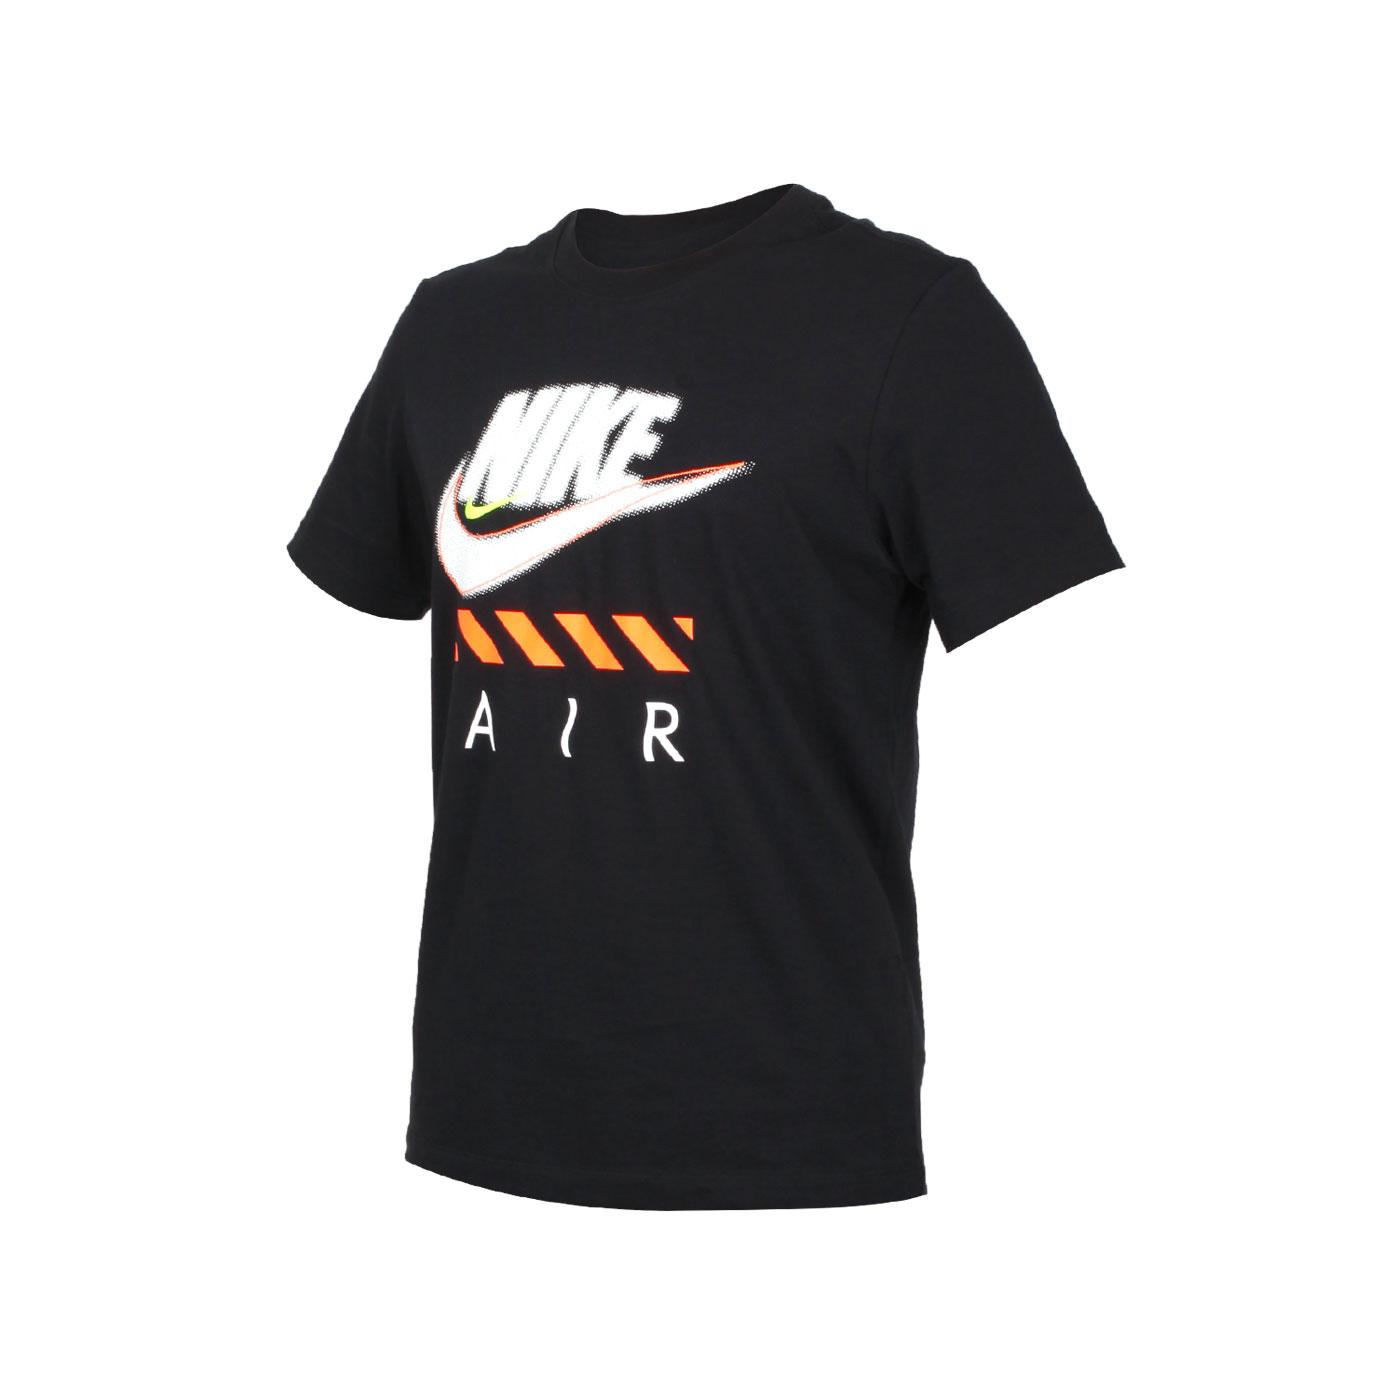 NIKE 男款短袖T恤 CT6533-010 - 黑白亮橘黃